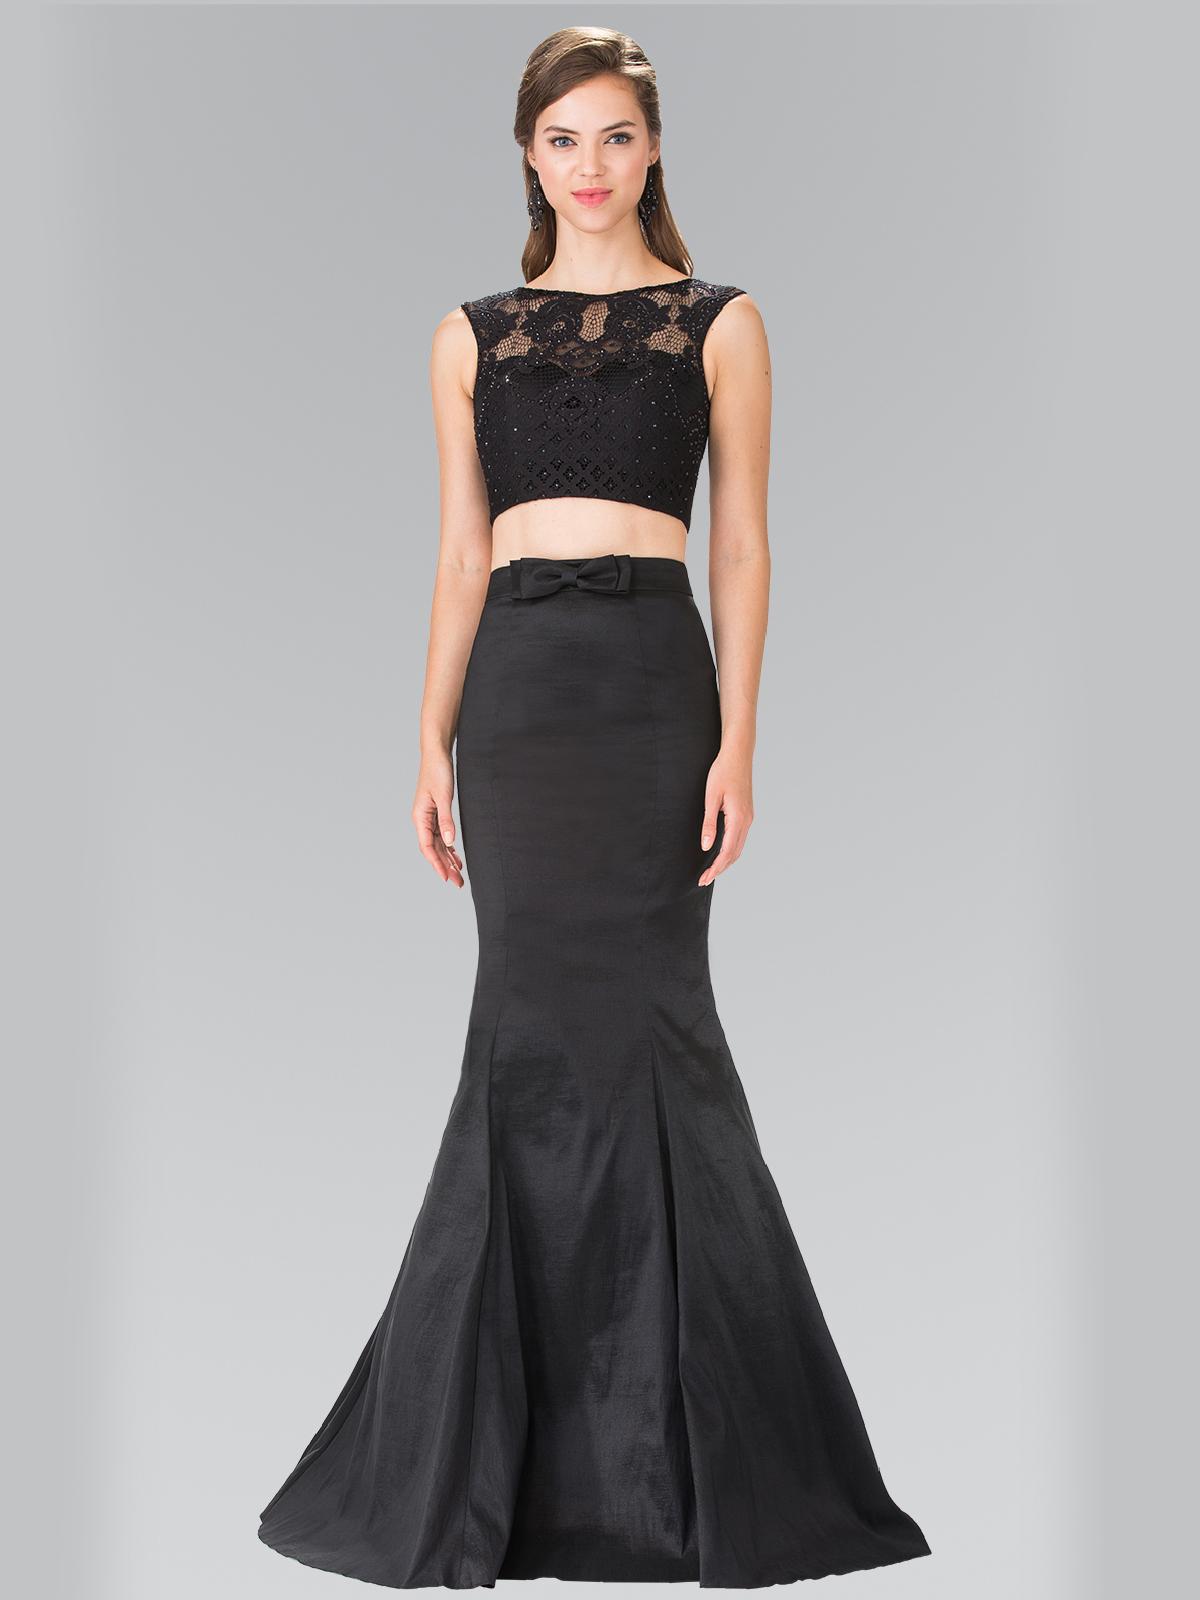 Two Piece Taffeta Long Prom Dress   Sung Boutique L.A.